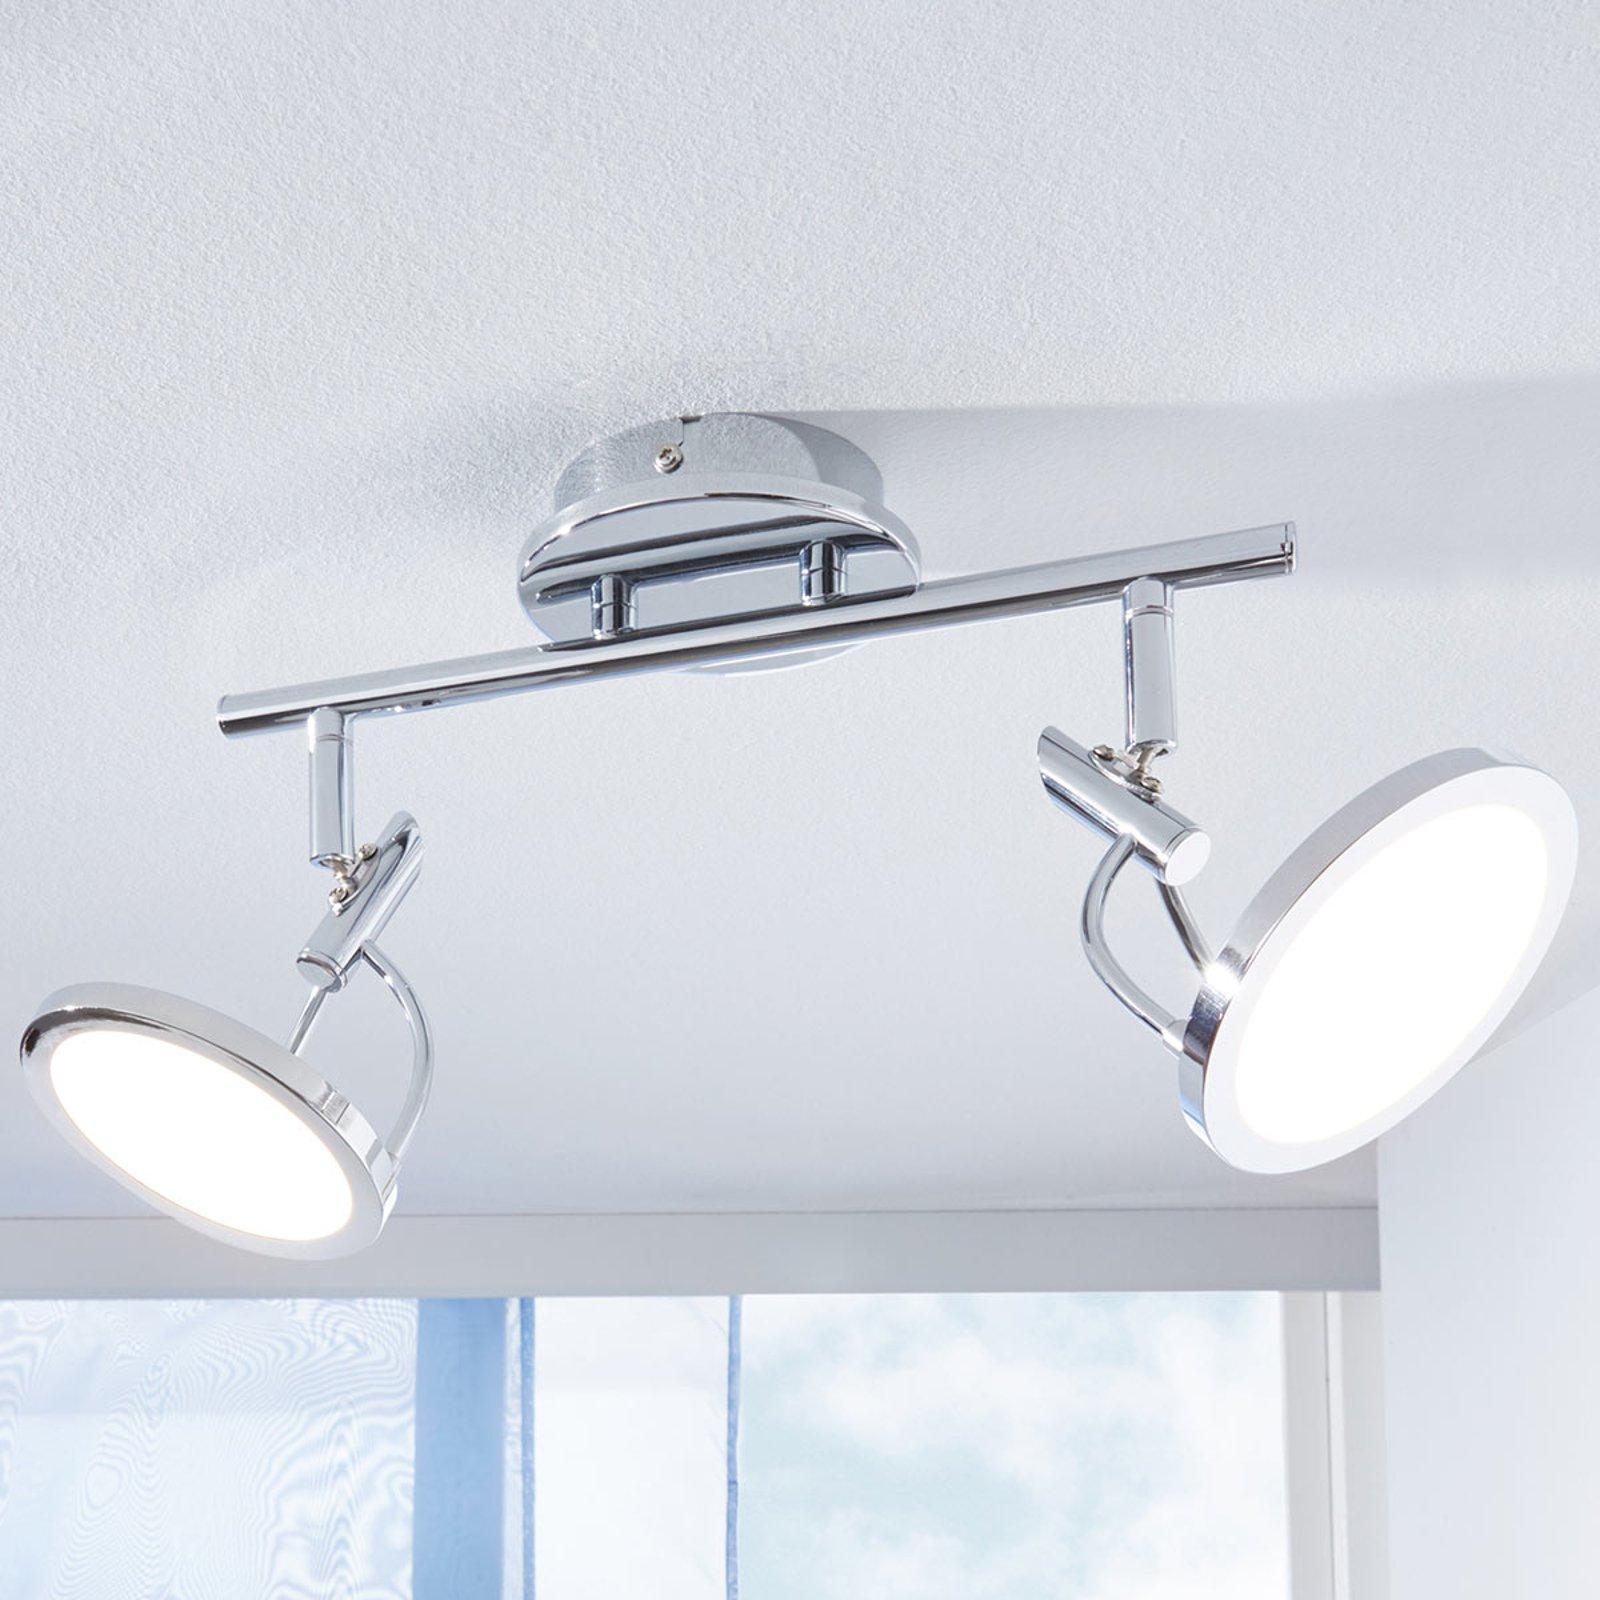 LED- takspot Jorne, forkrommet, 2 lyskilder